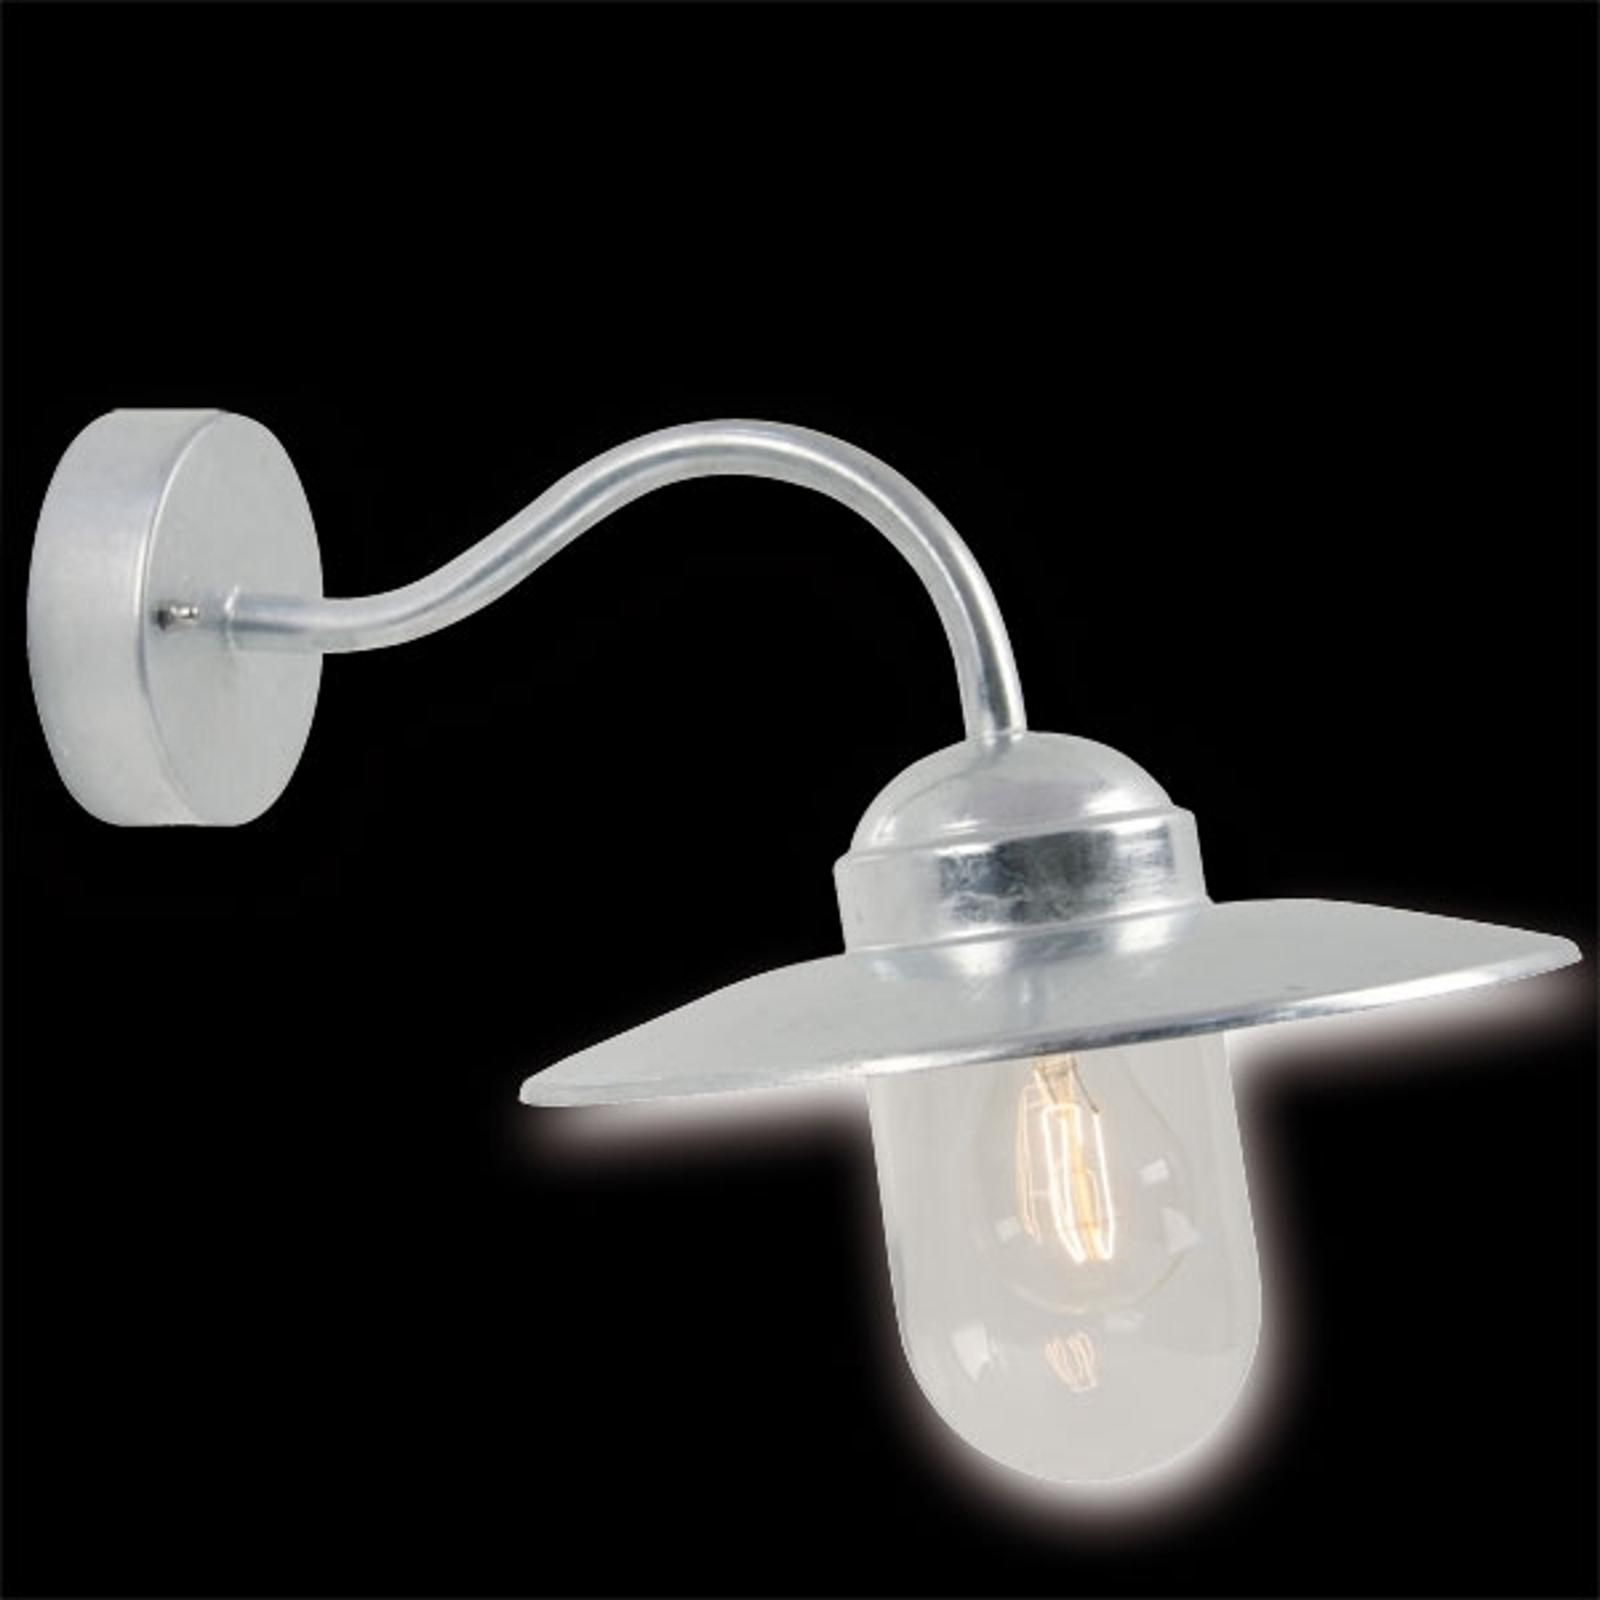 Buitenwandlamp Luxemburg thermisch verzinkt - IP54